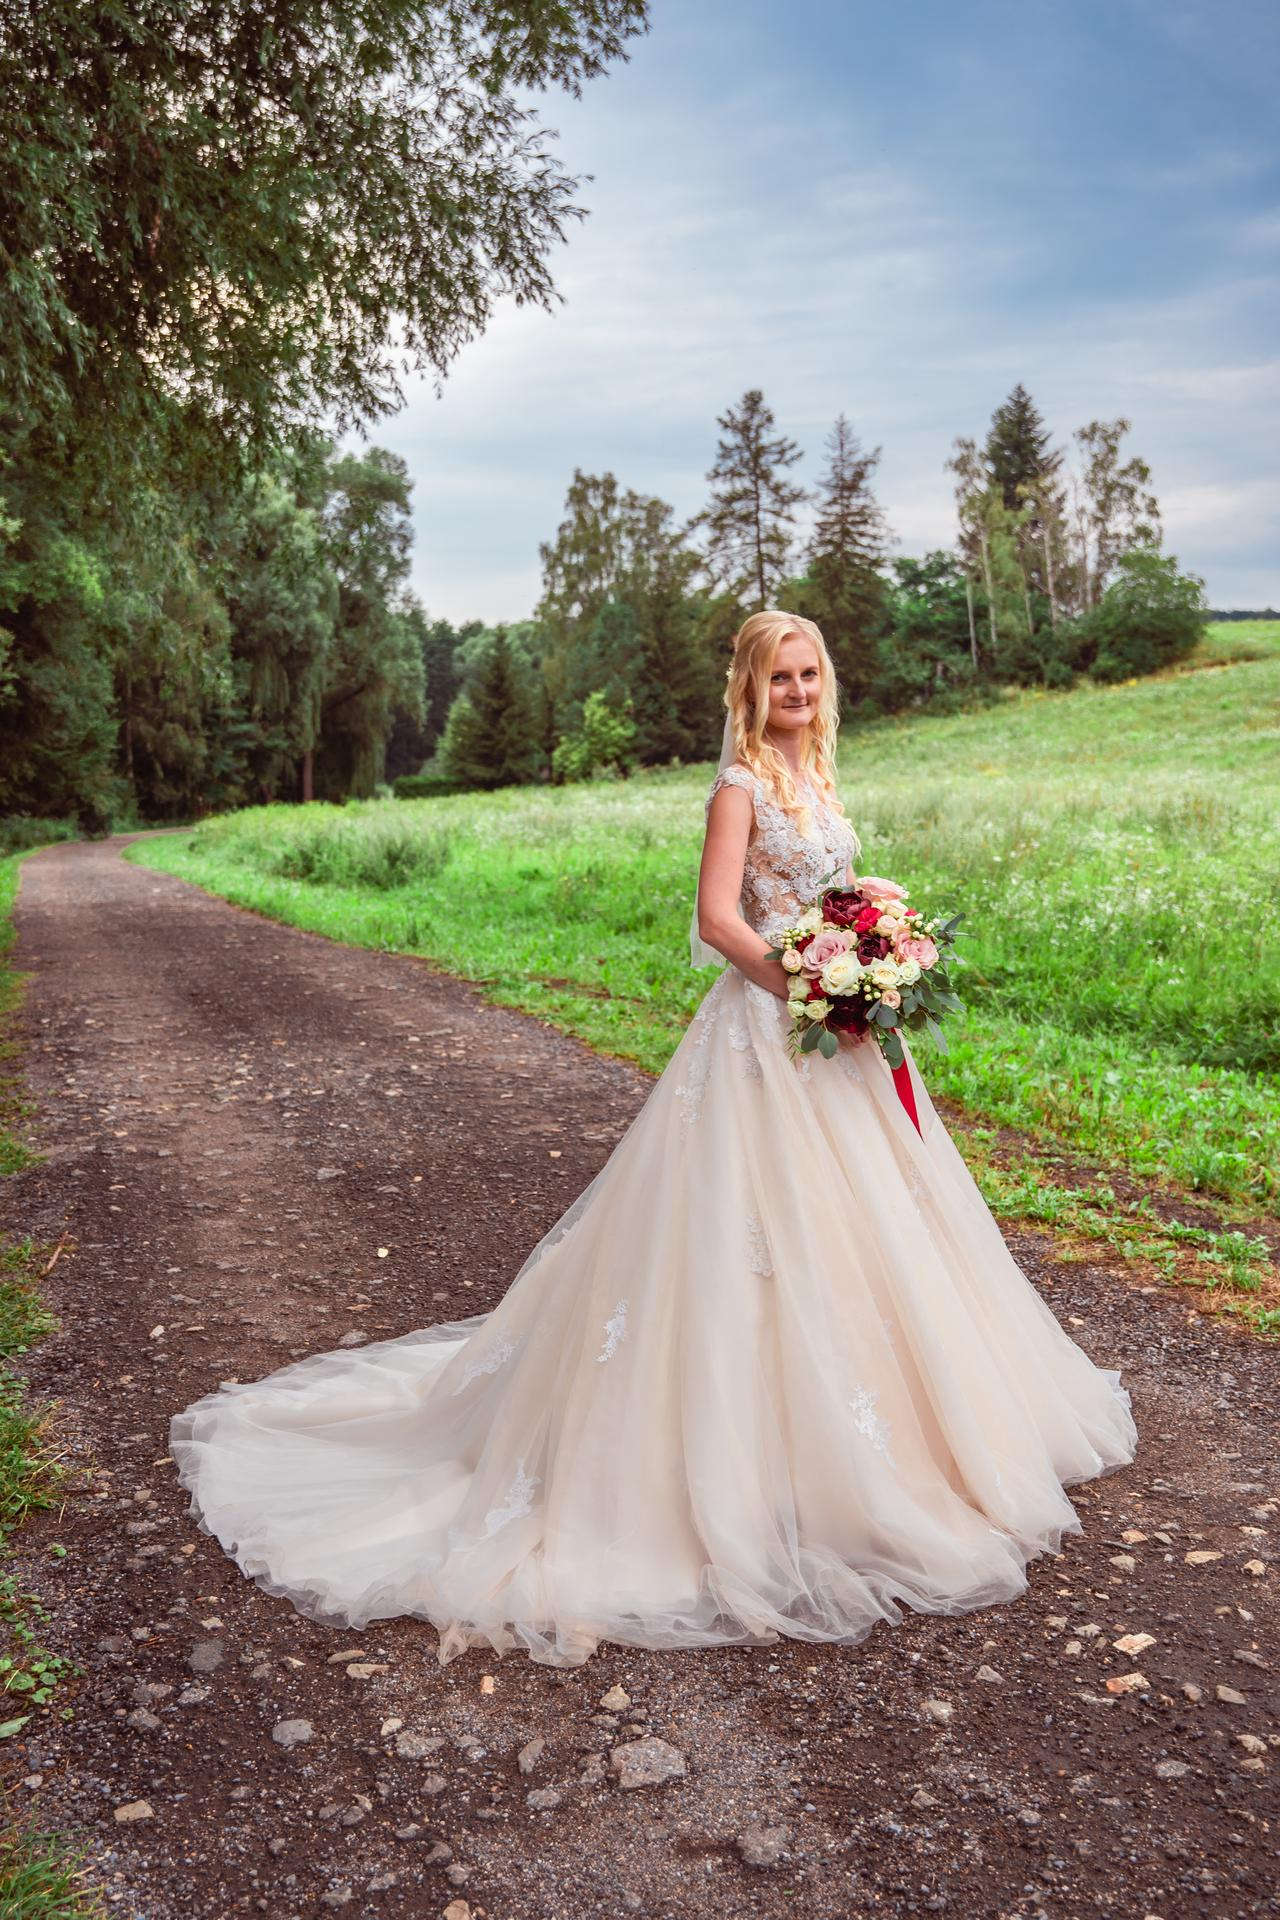 Alžběta                    a                    Štěpán - 🌸🌺 Dokonalé šaty Pronovias Ofelia